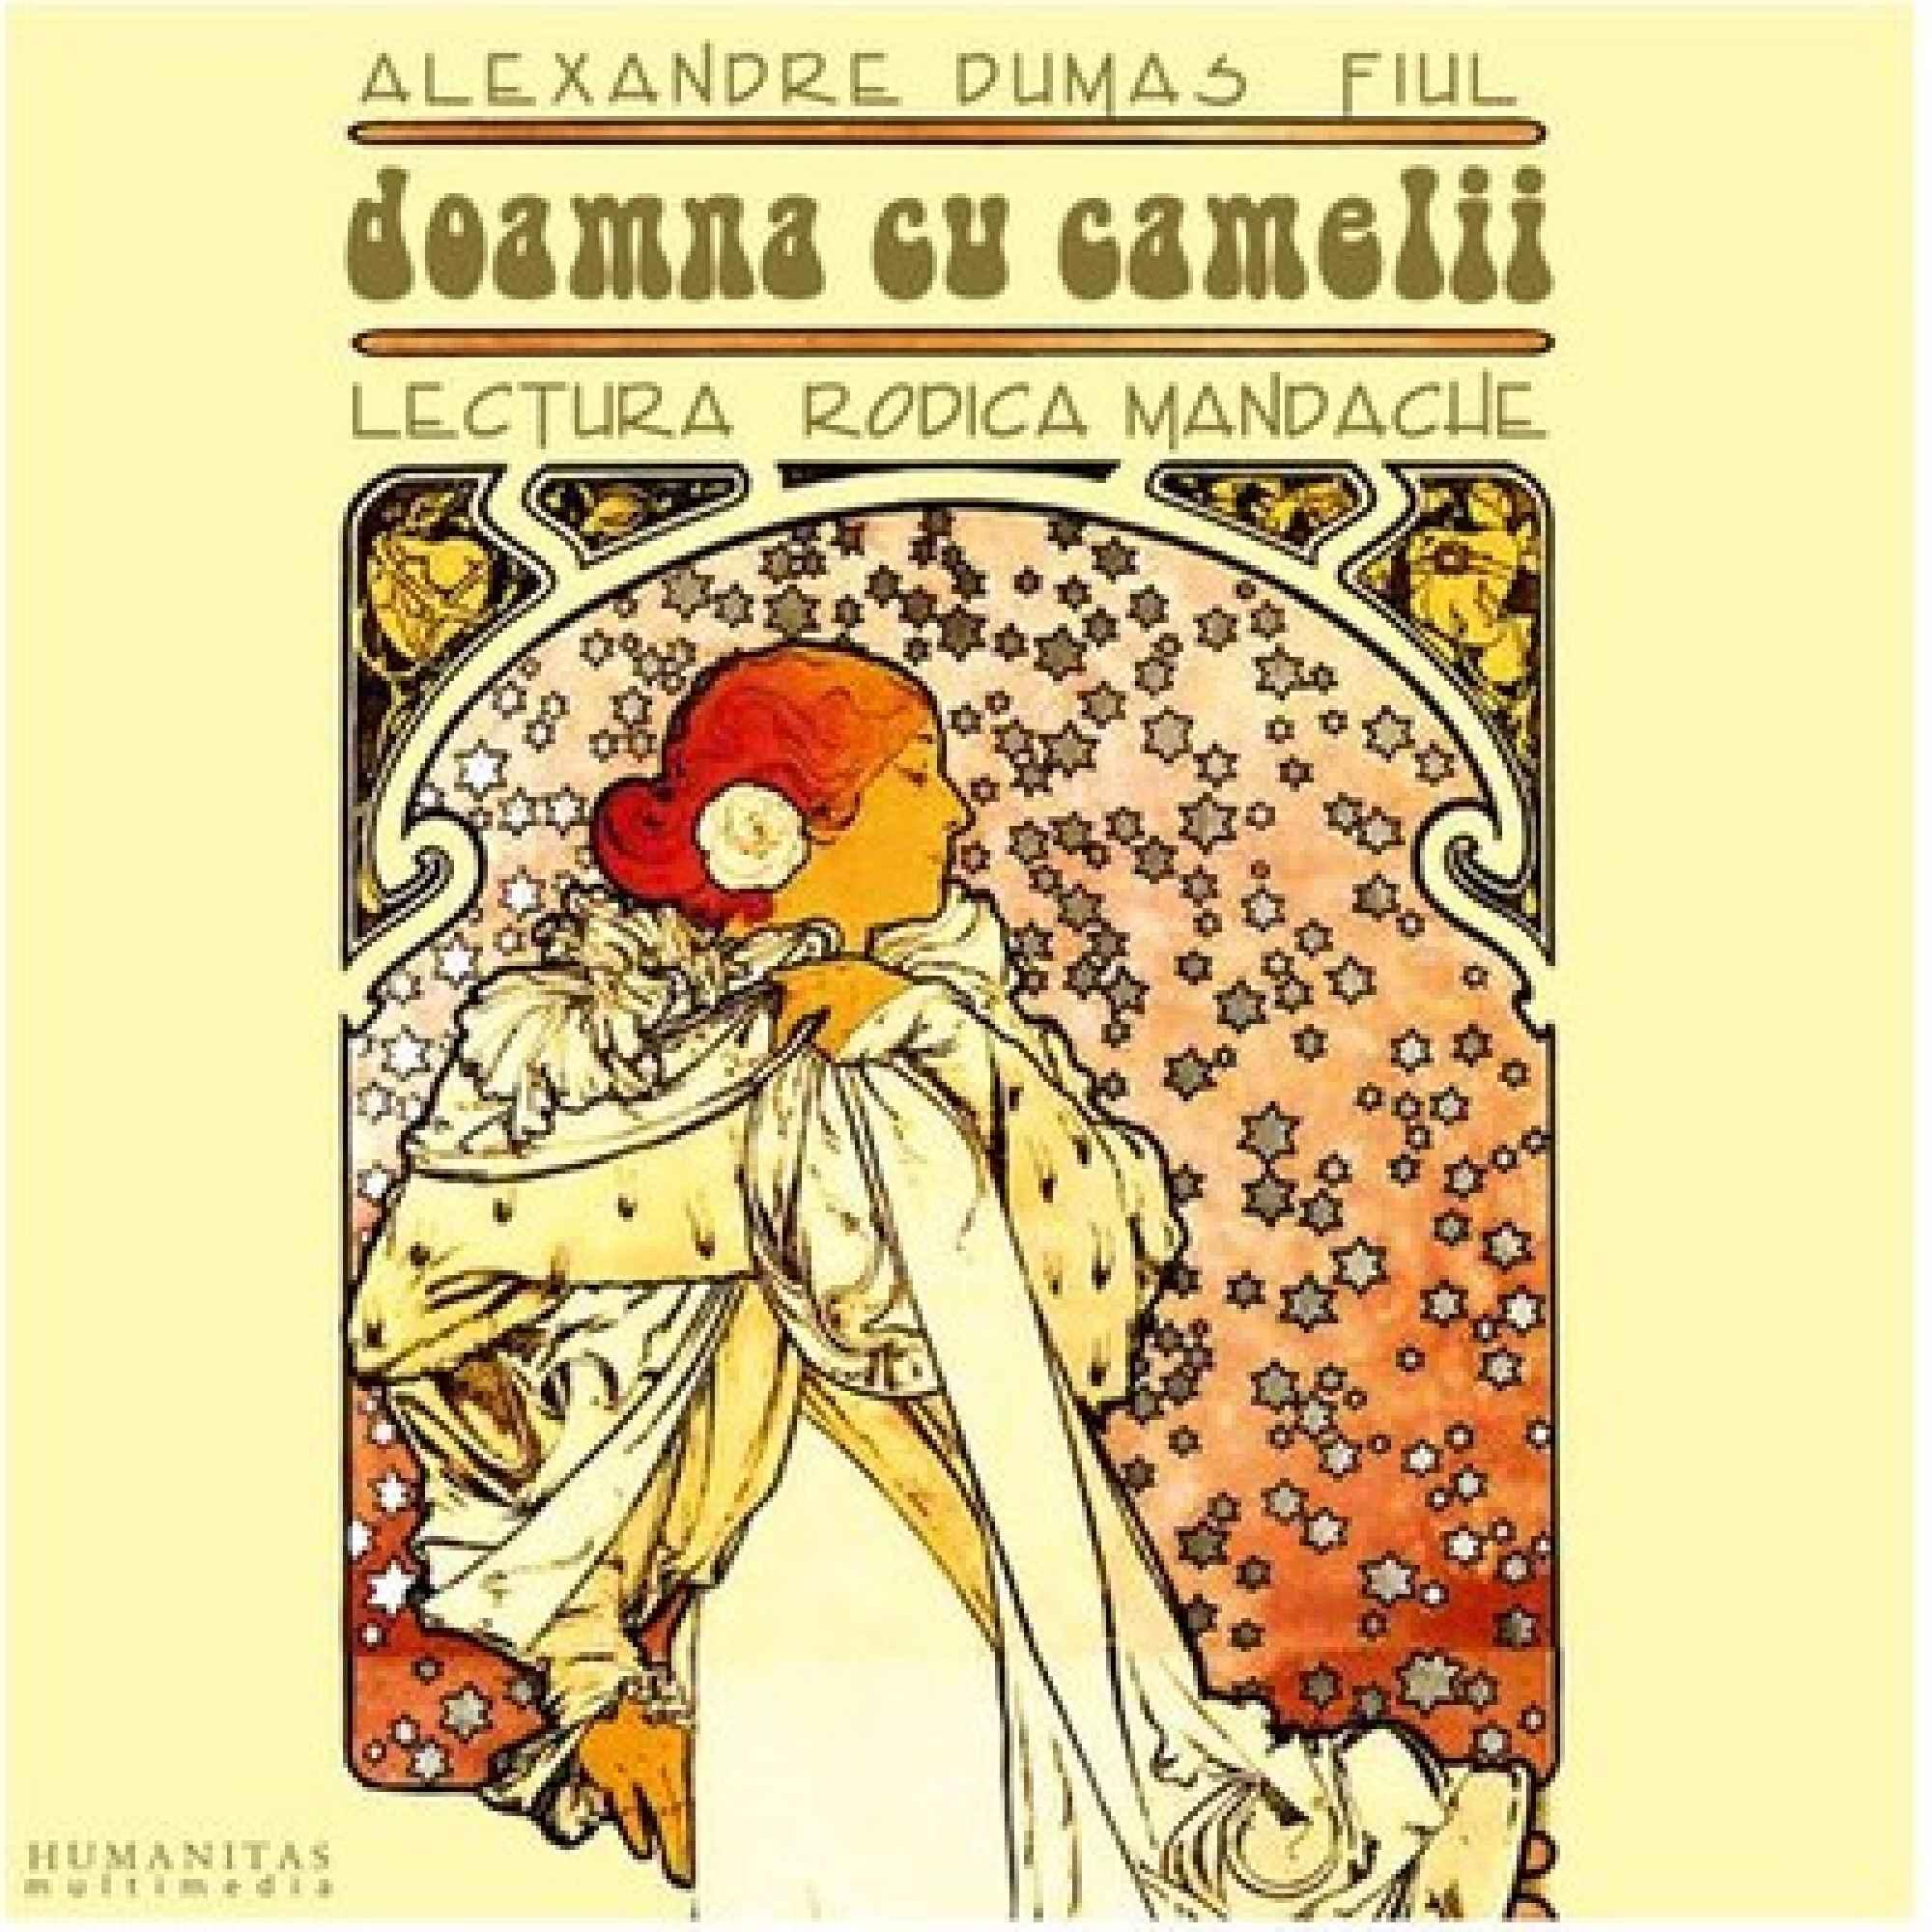 Doamna cu camelii